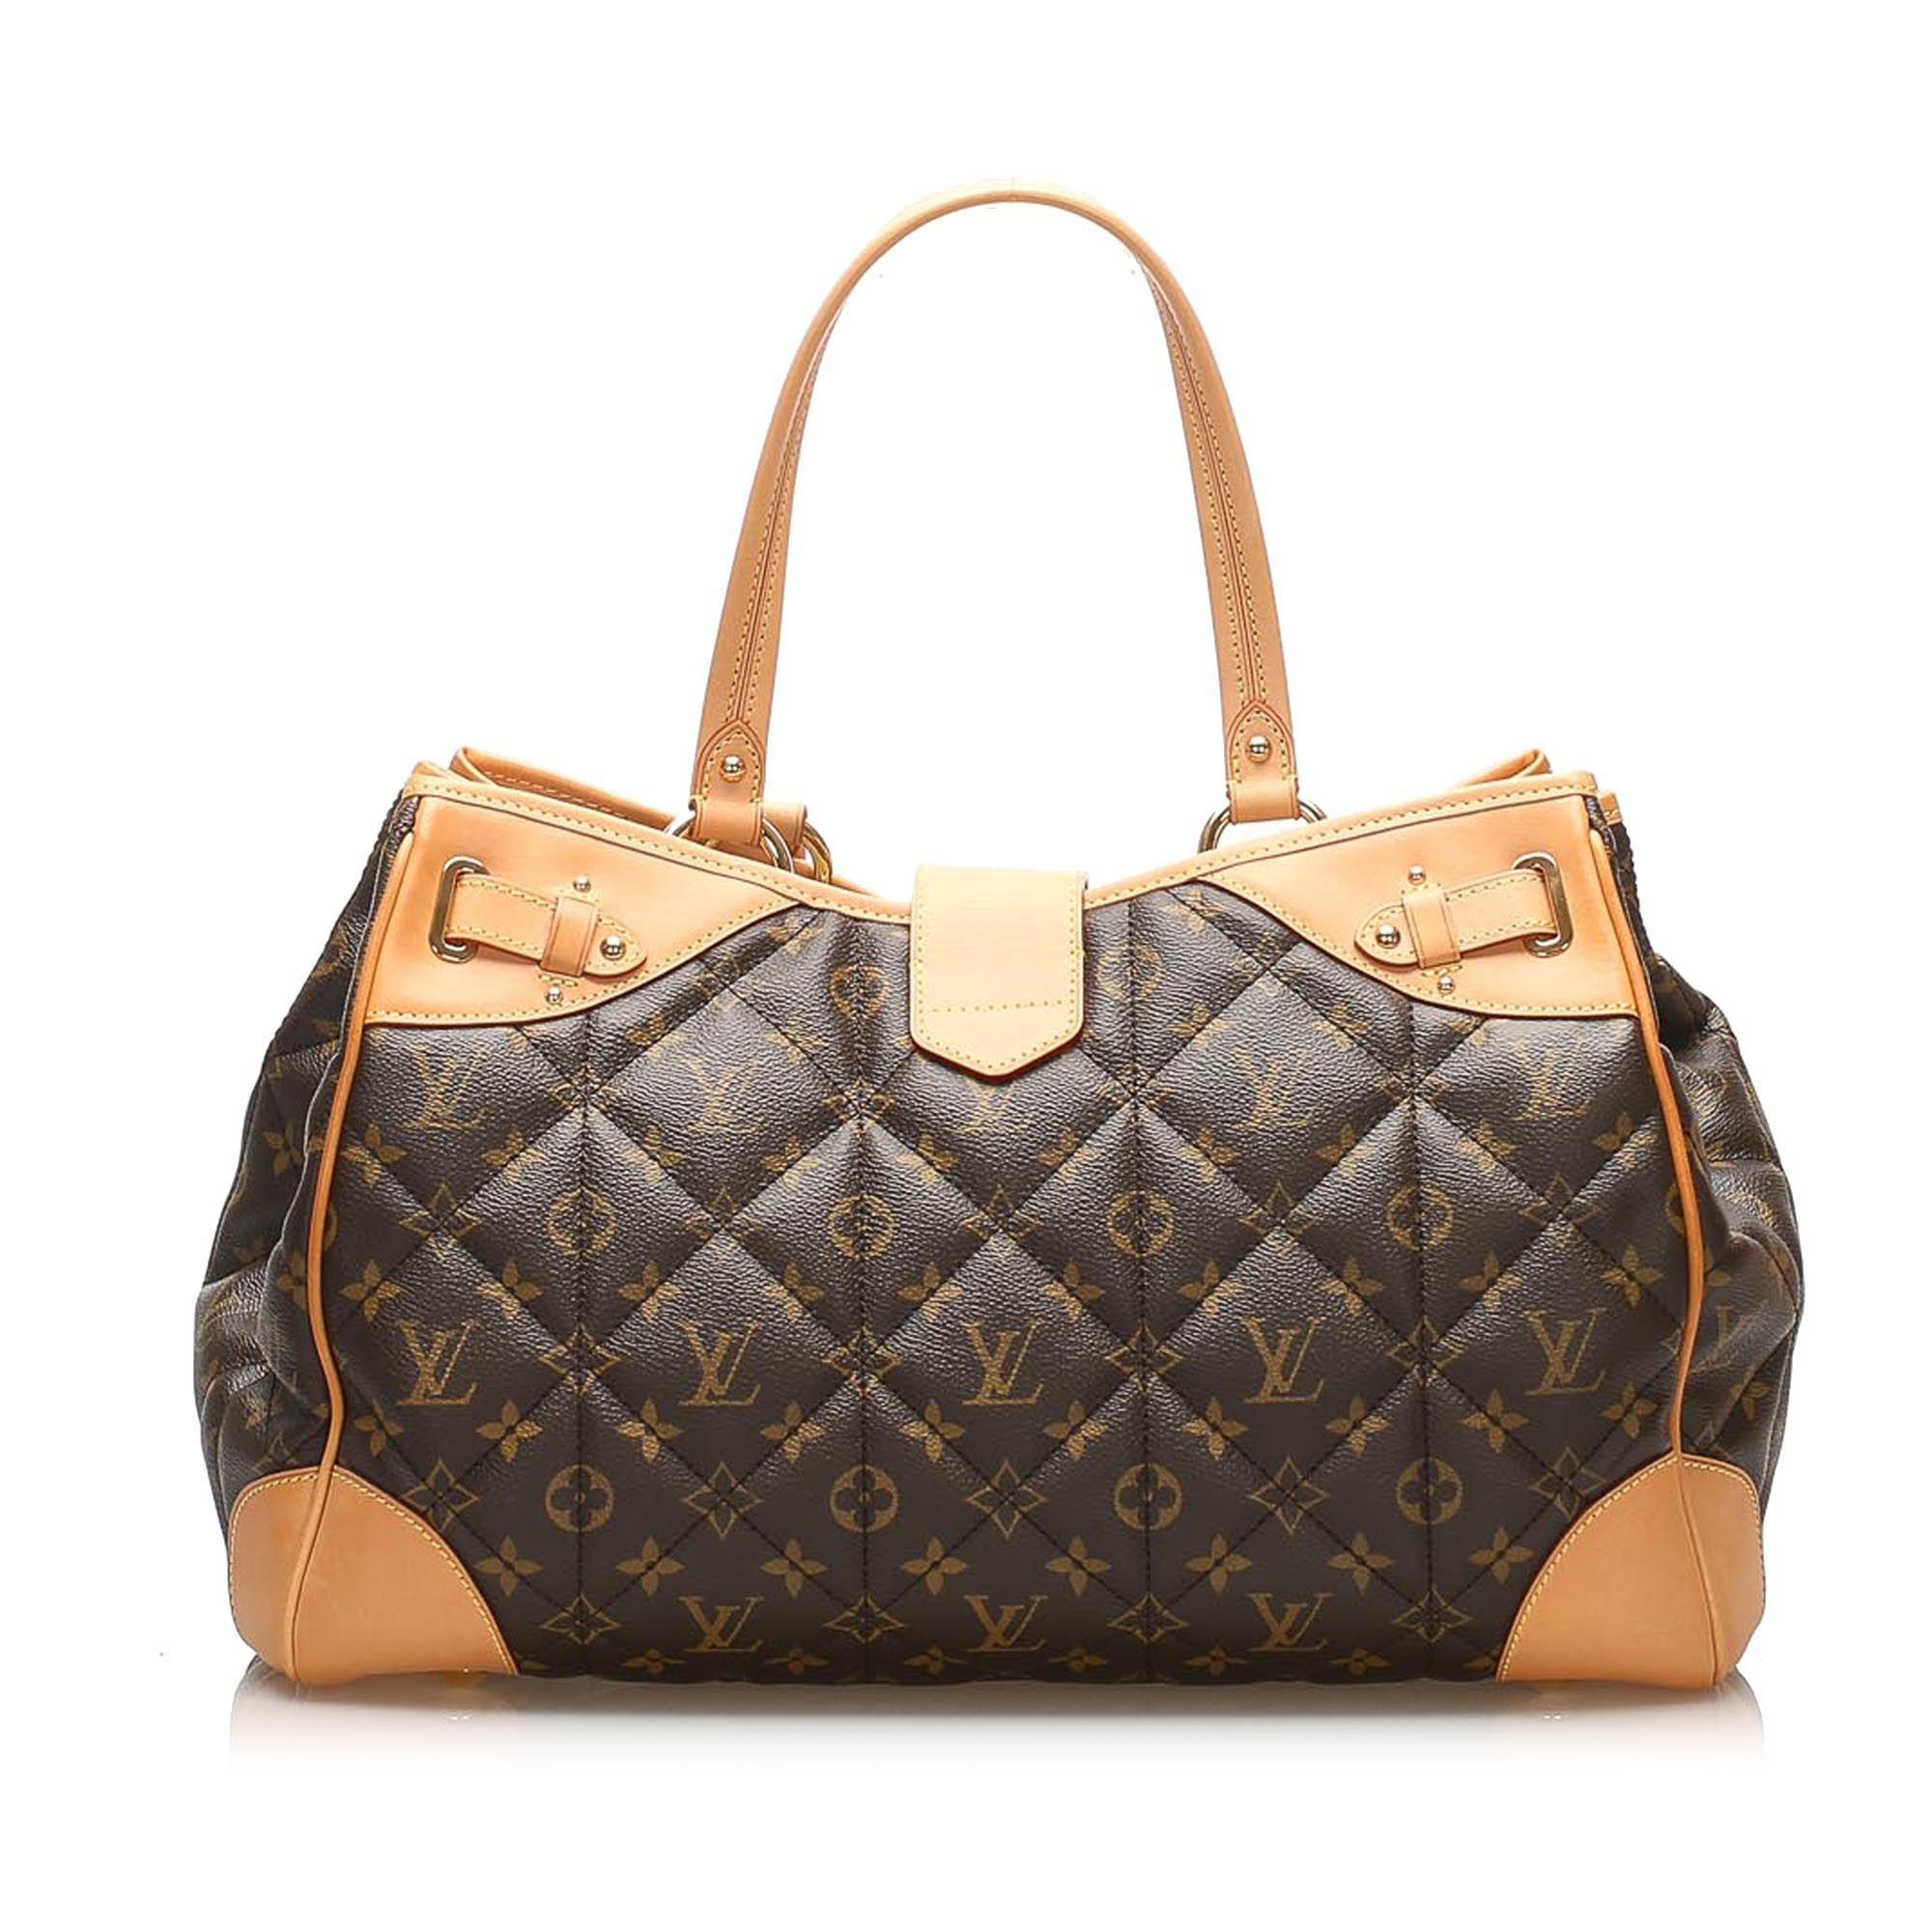 Vintage Louis Vuitton Monogram Etoile Shopper Brown